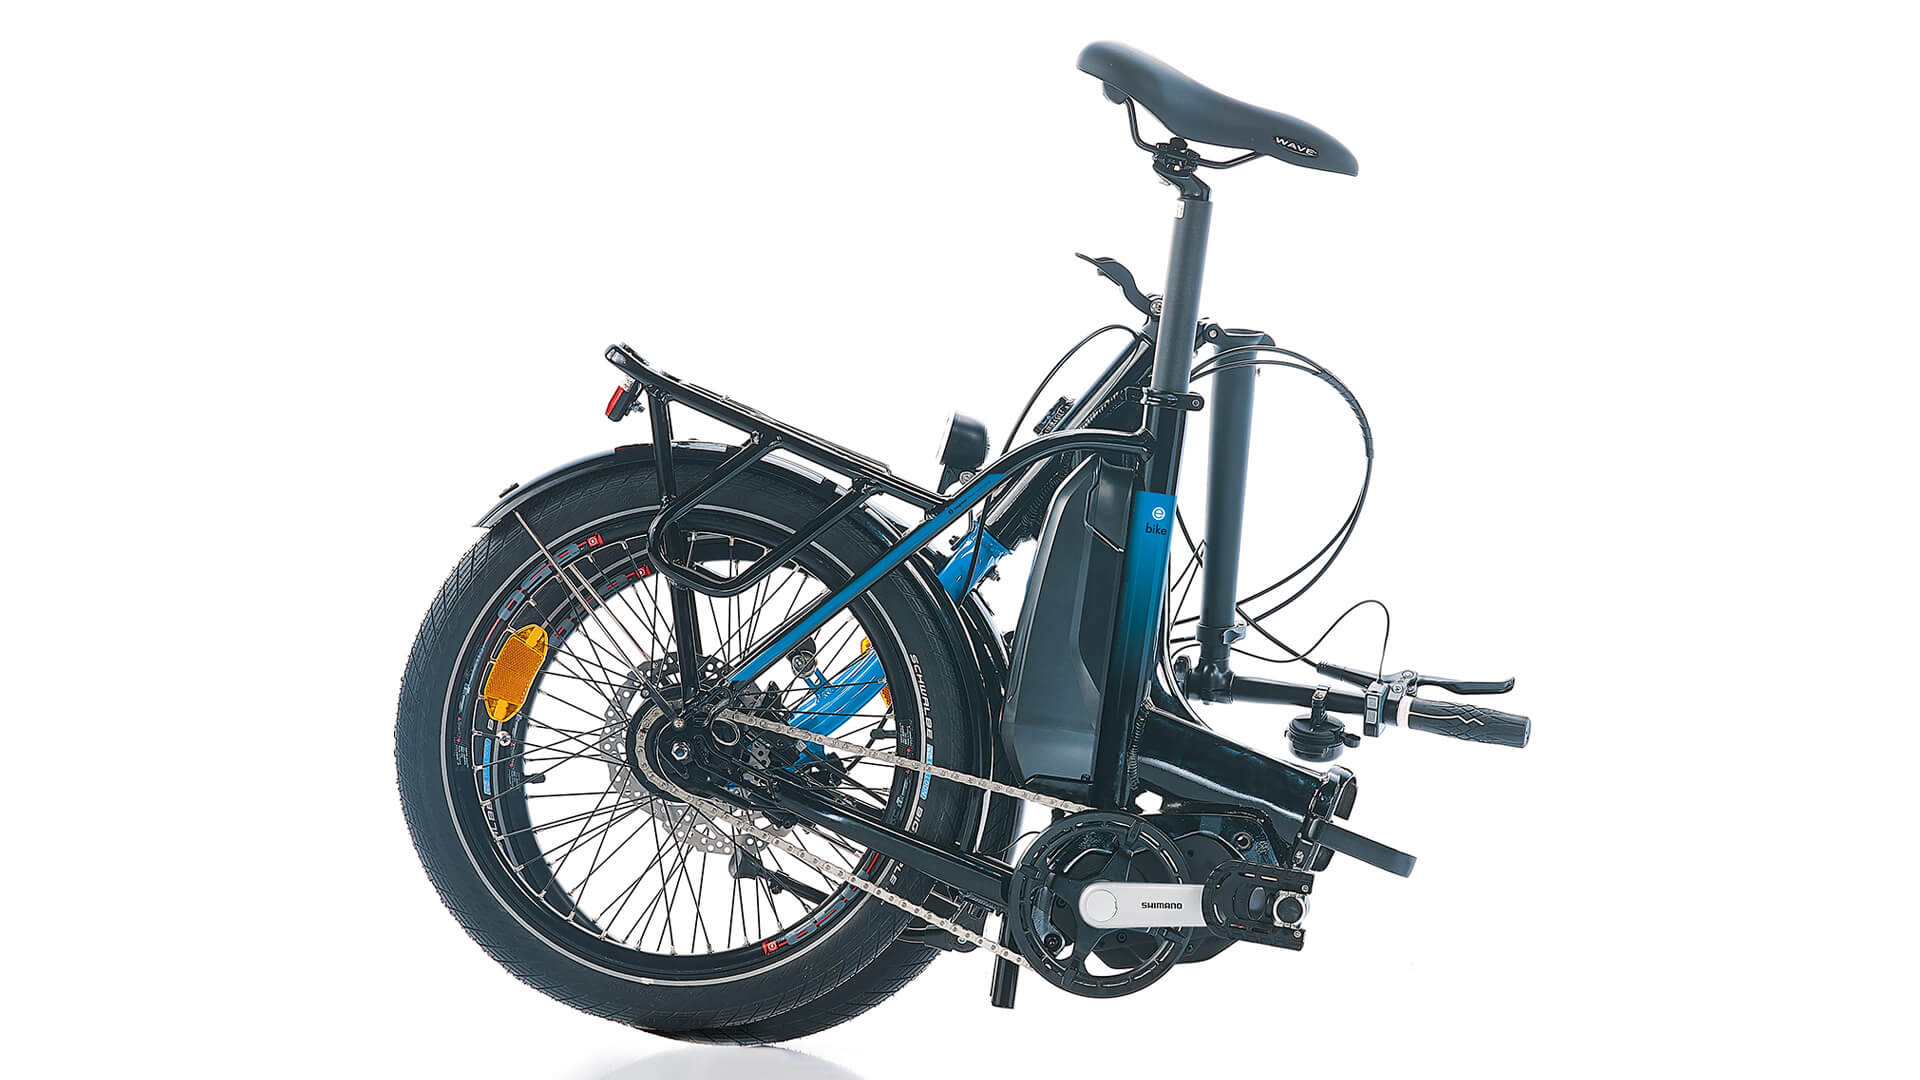 carraro 20 flexi e bike nexus 8 vites hidrolik disk. Black Bedroom Furniture Sets. Home Design Ideas